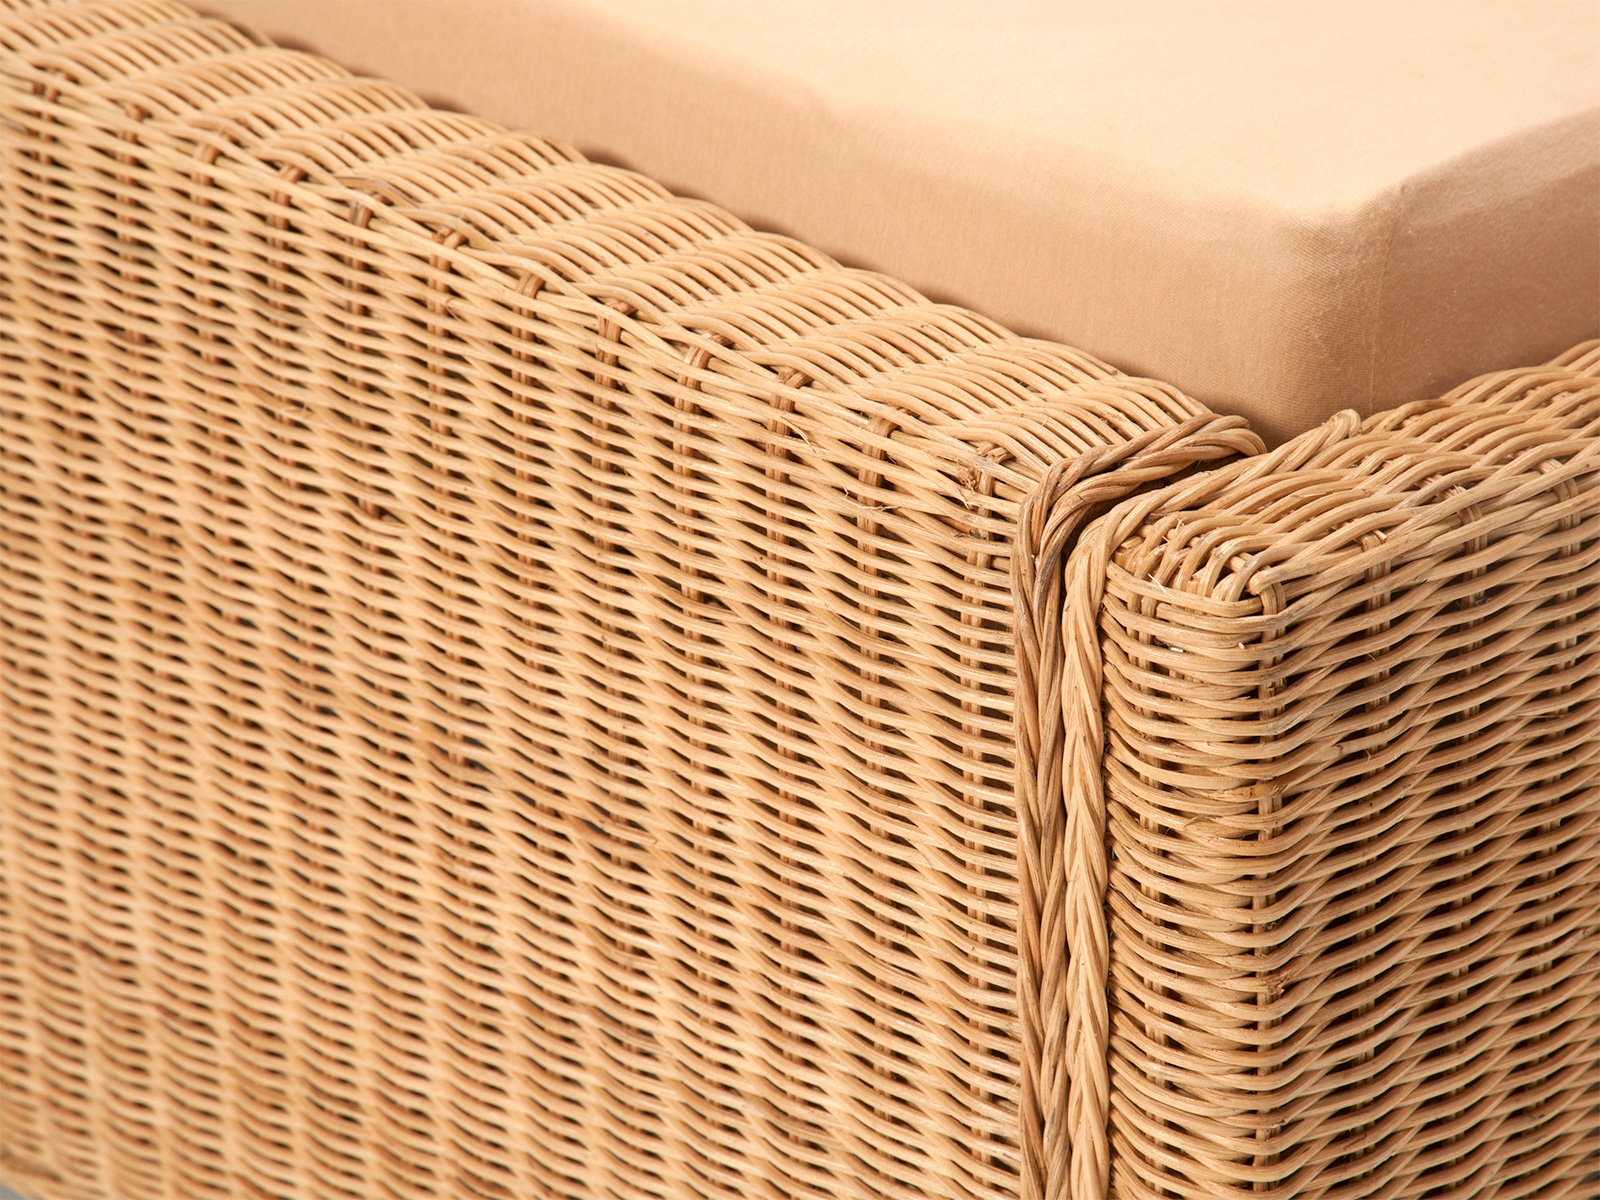 rattanbett karma komfort 180 x 200 cm rattan korbhaus. Black Bedroom Furniture Sets. Home Design Ideas